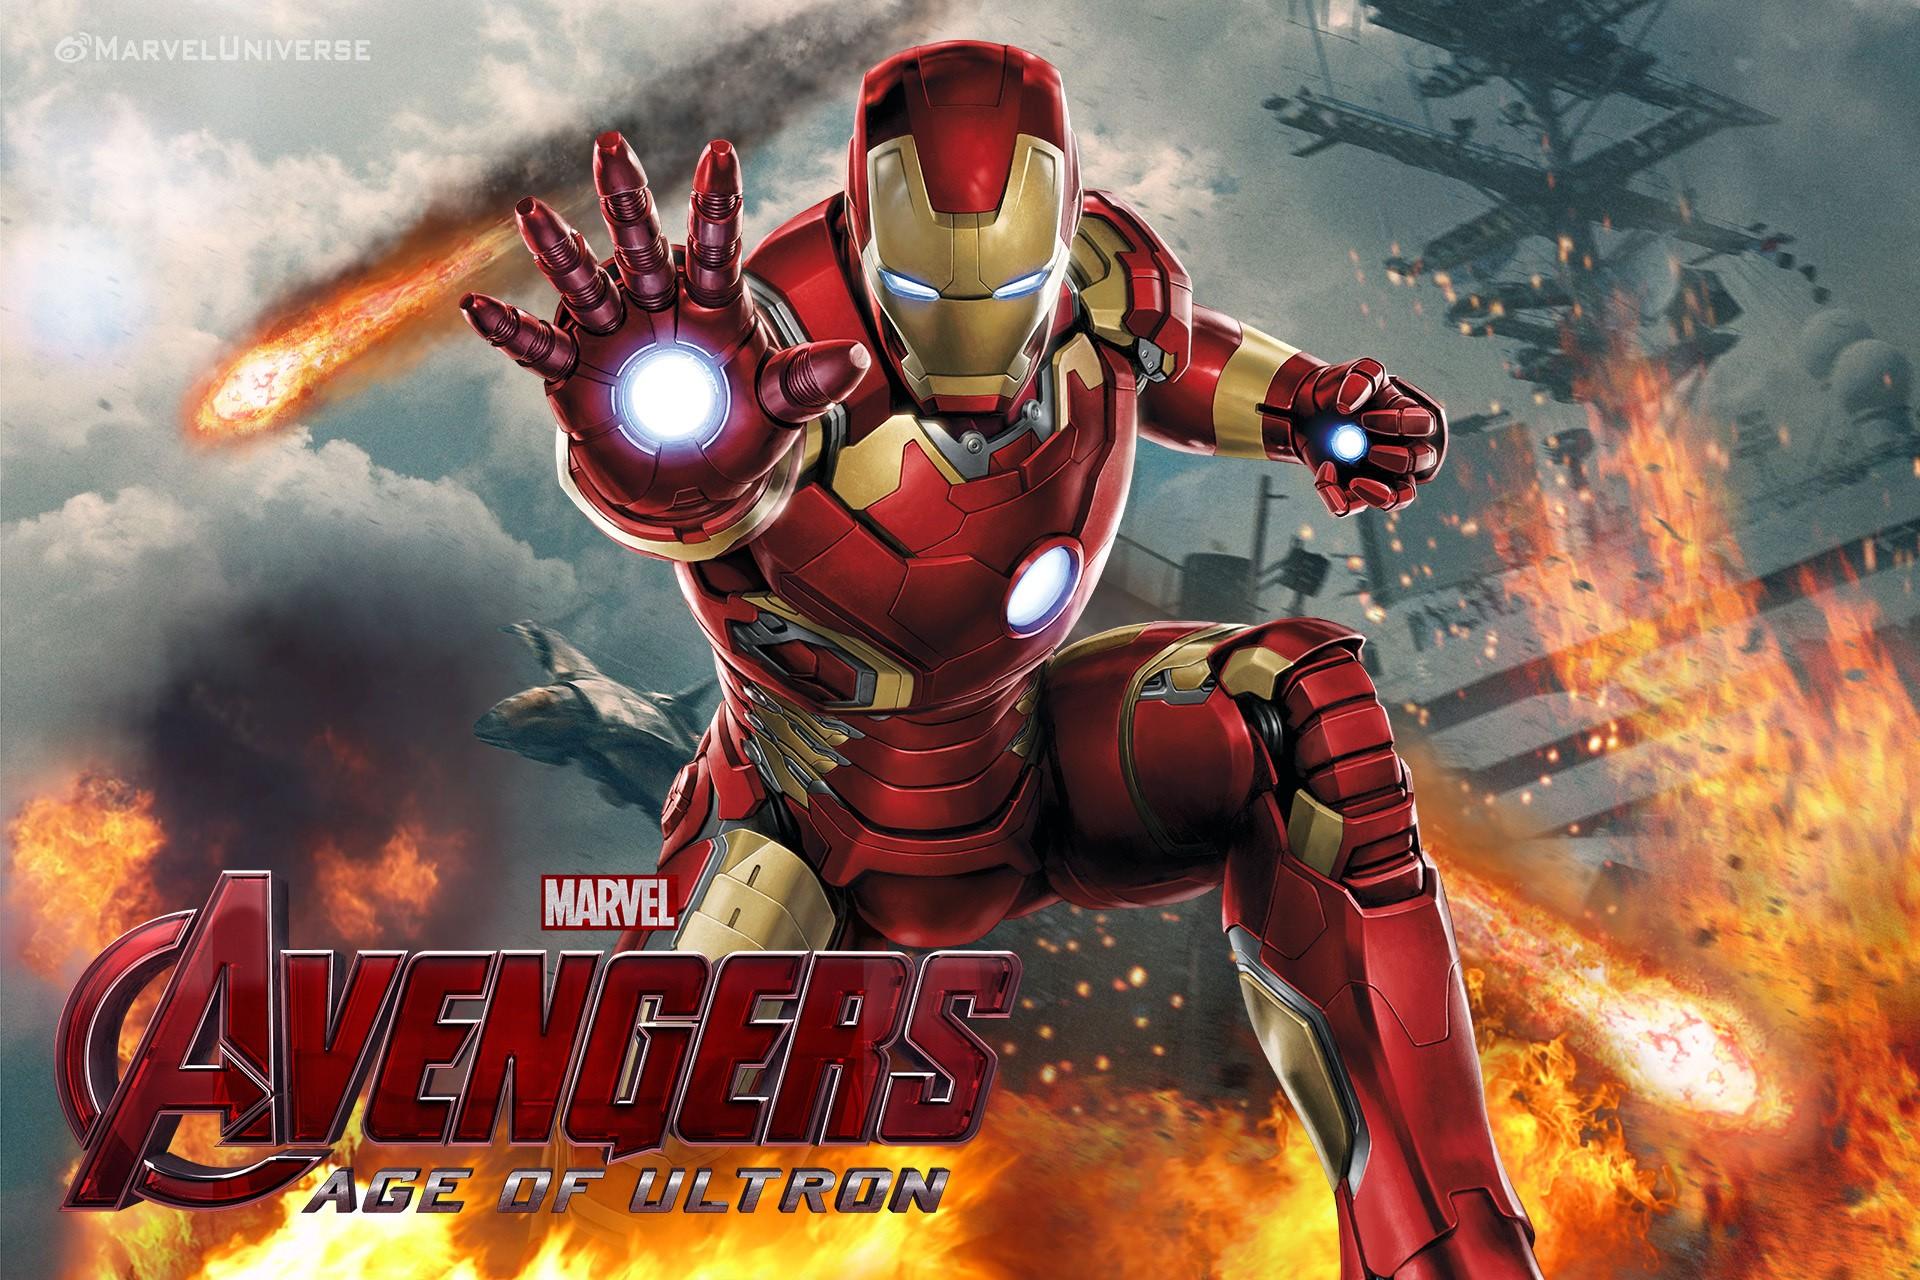 Avengers Age Of Ultron Marvel Comics Iron Man Download Wallpaper